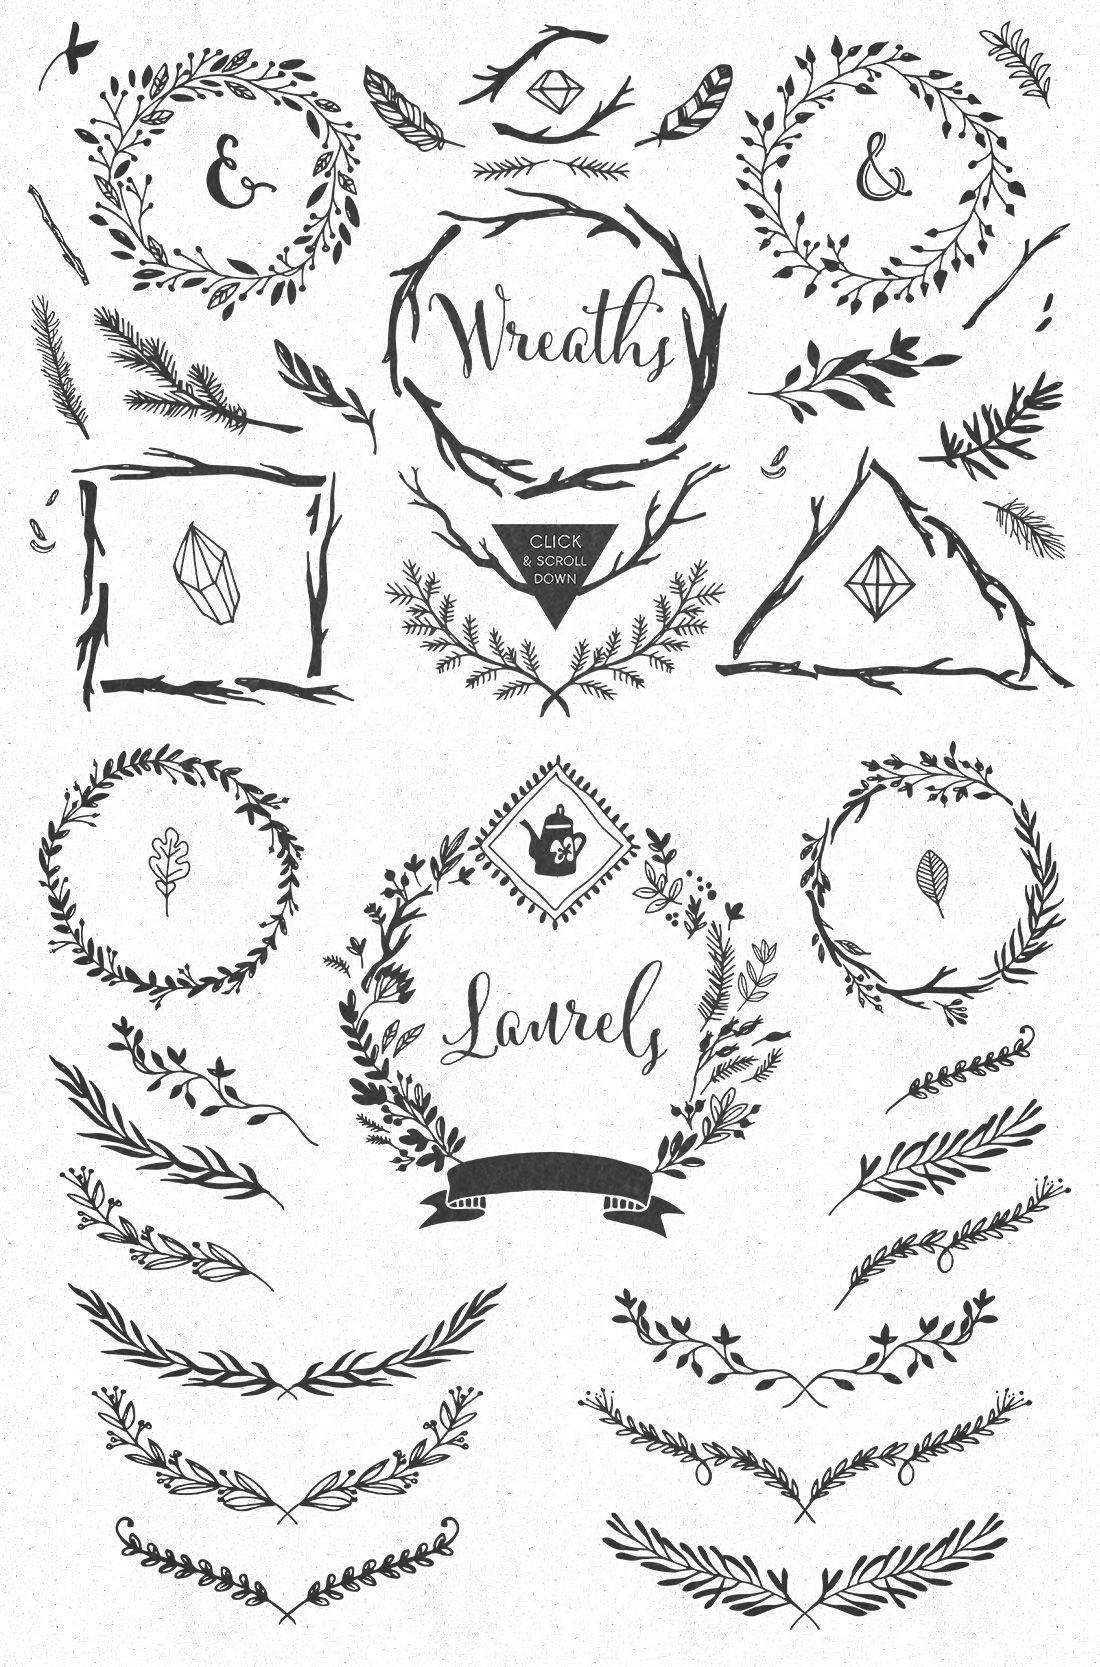 Handsketched Rustic Elements Collar Bone Tattoo Flower Tattoos Arrow Tattoos